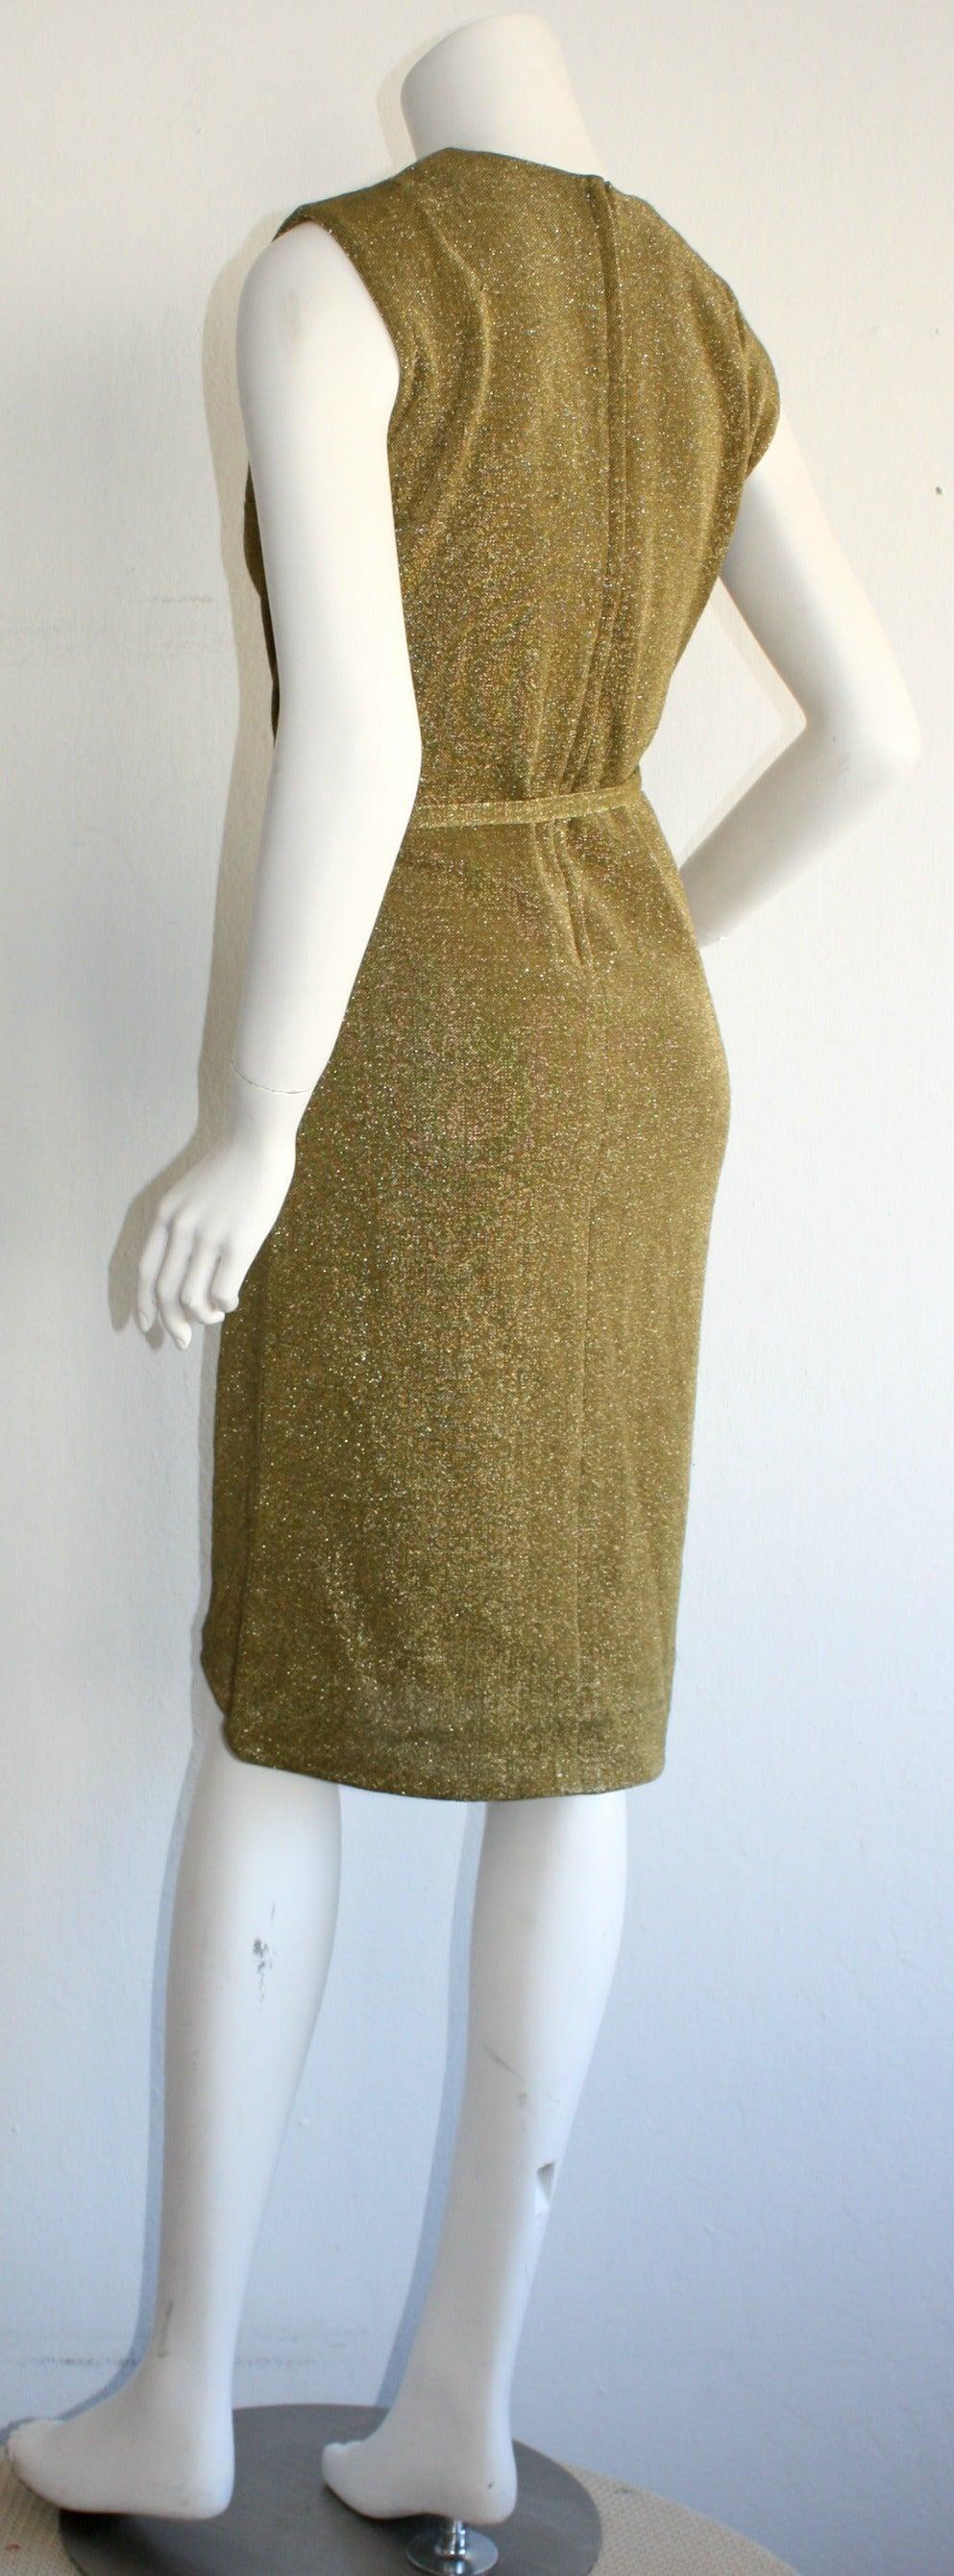 Rudi Gernreich For Harmon Knits 1960s Gold Metallic Dress 6